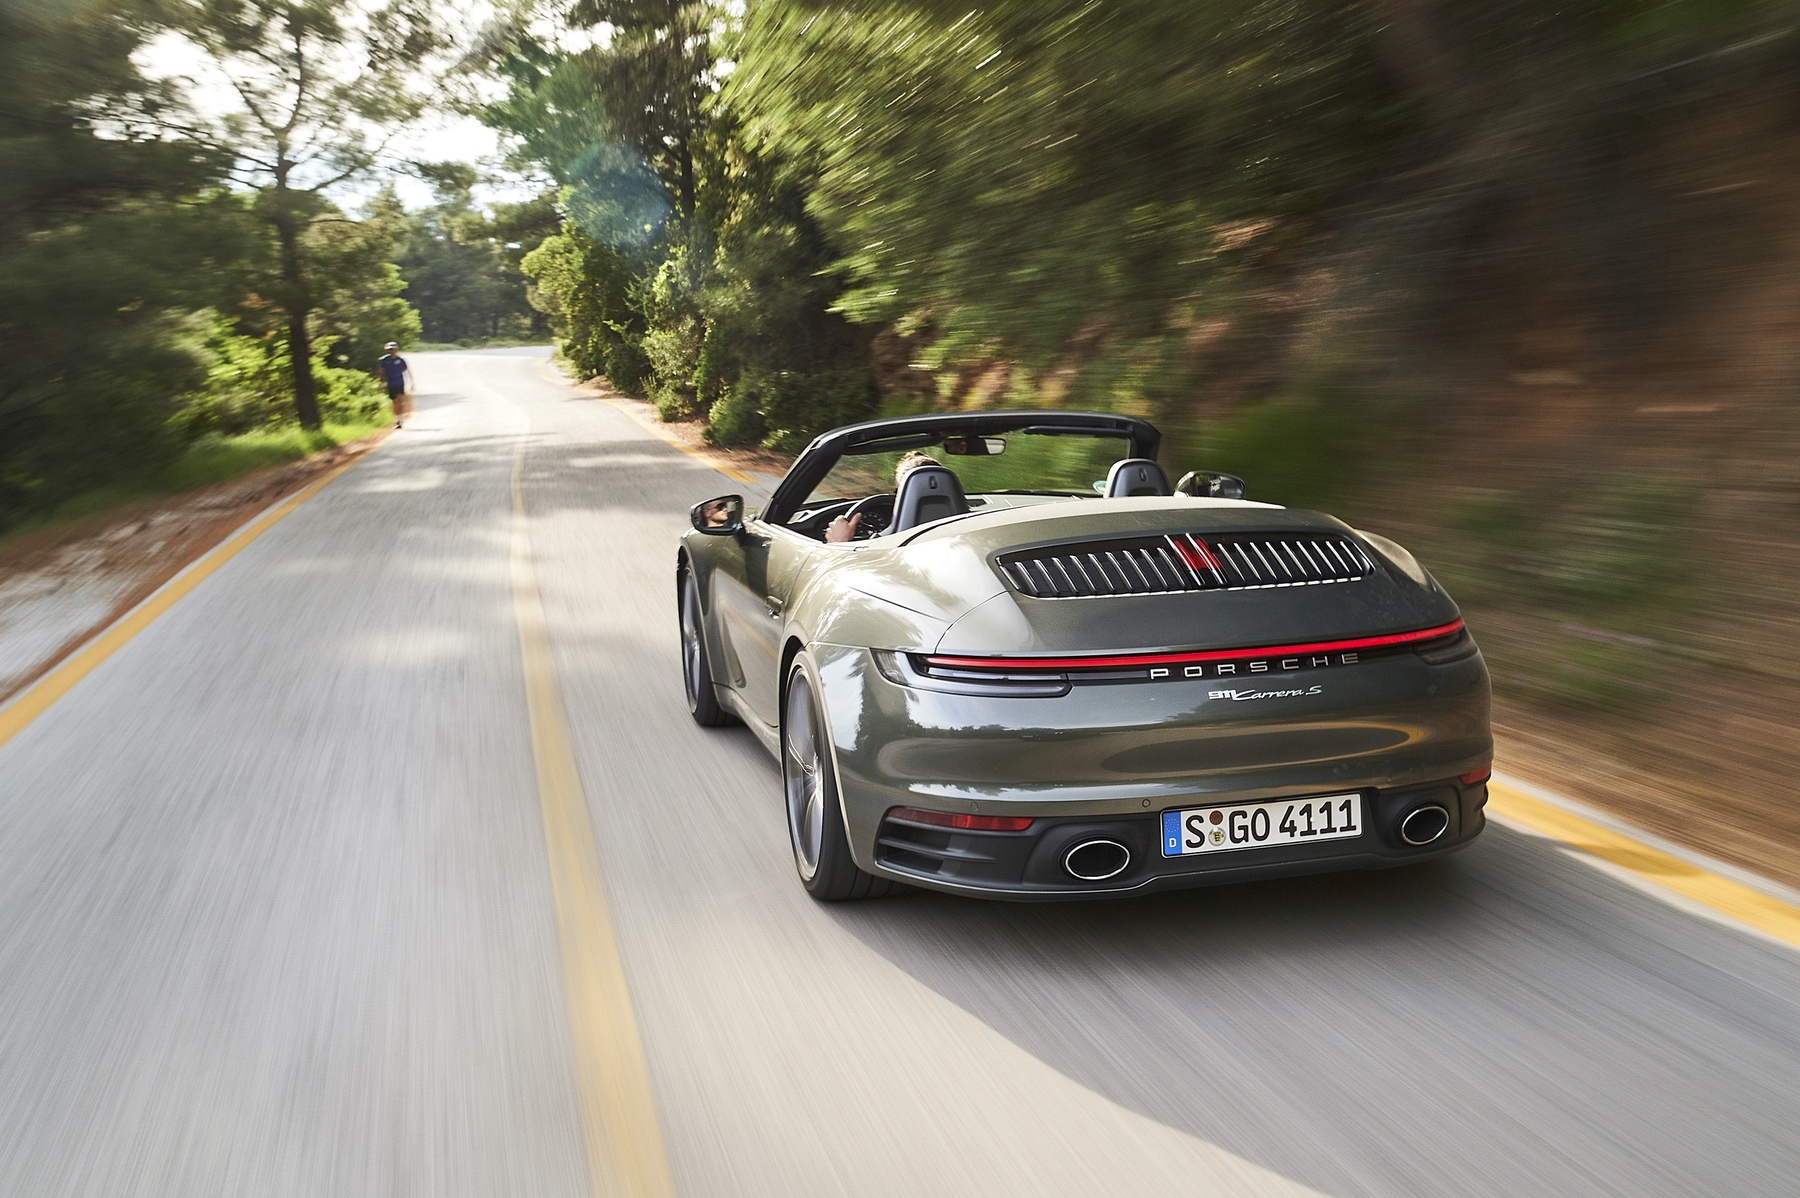 Test_Drive_Porsche_911_Athens_0109